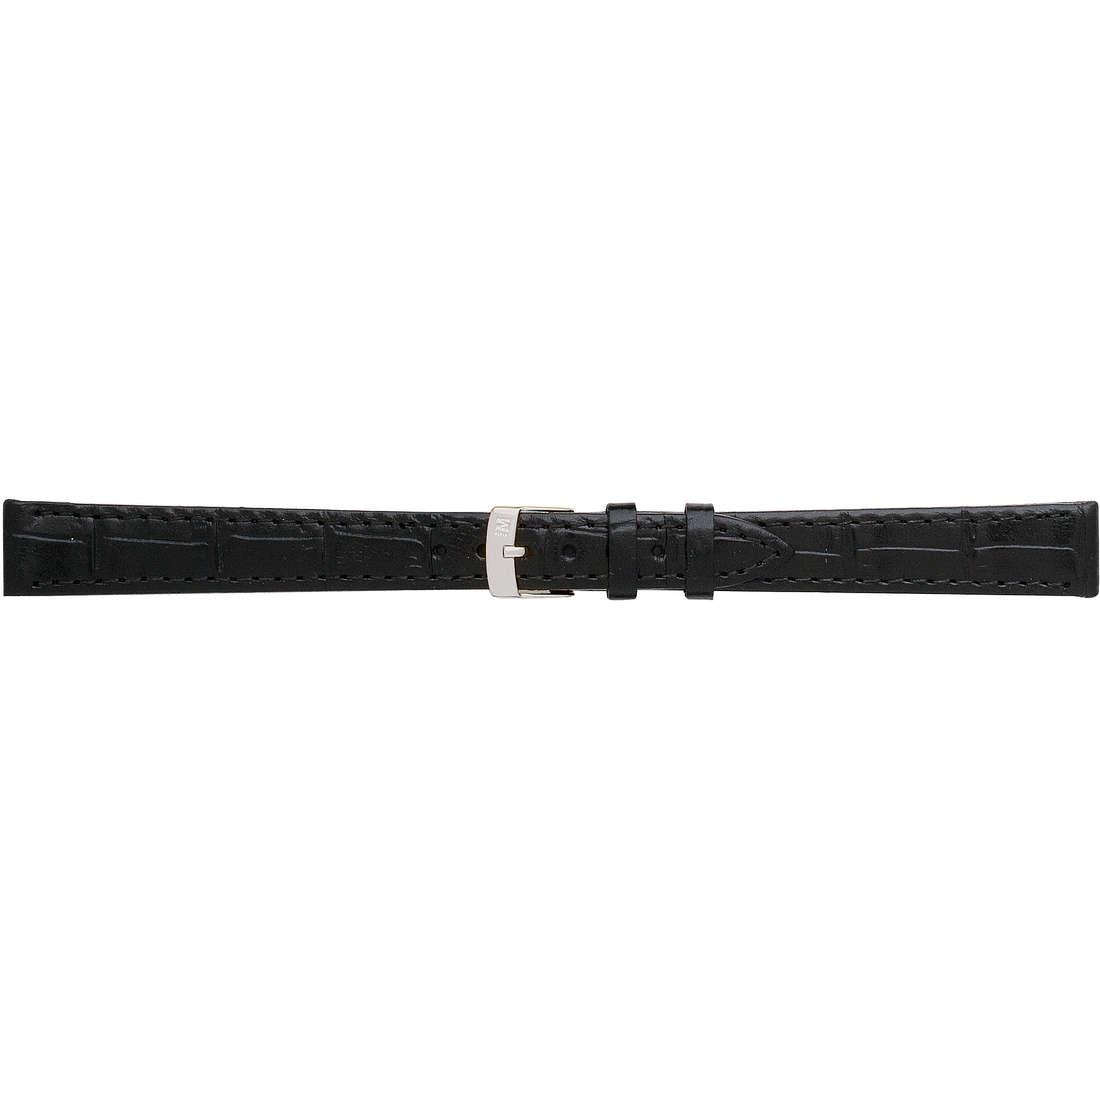 montre bande de montres unisex Morellato I Lunghi A01Y2524656019CR18